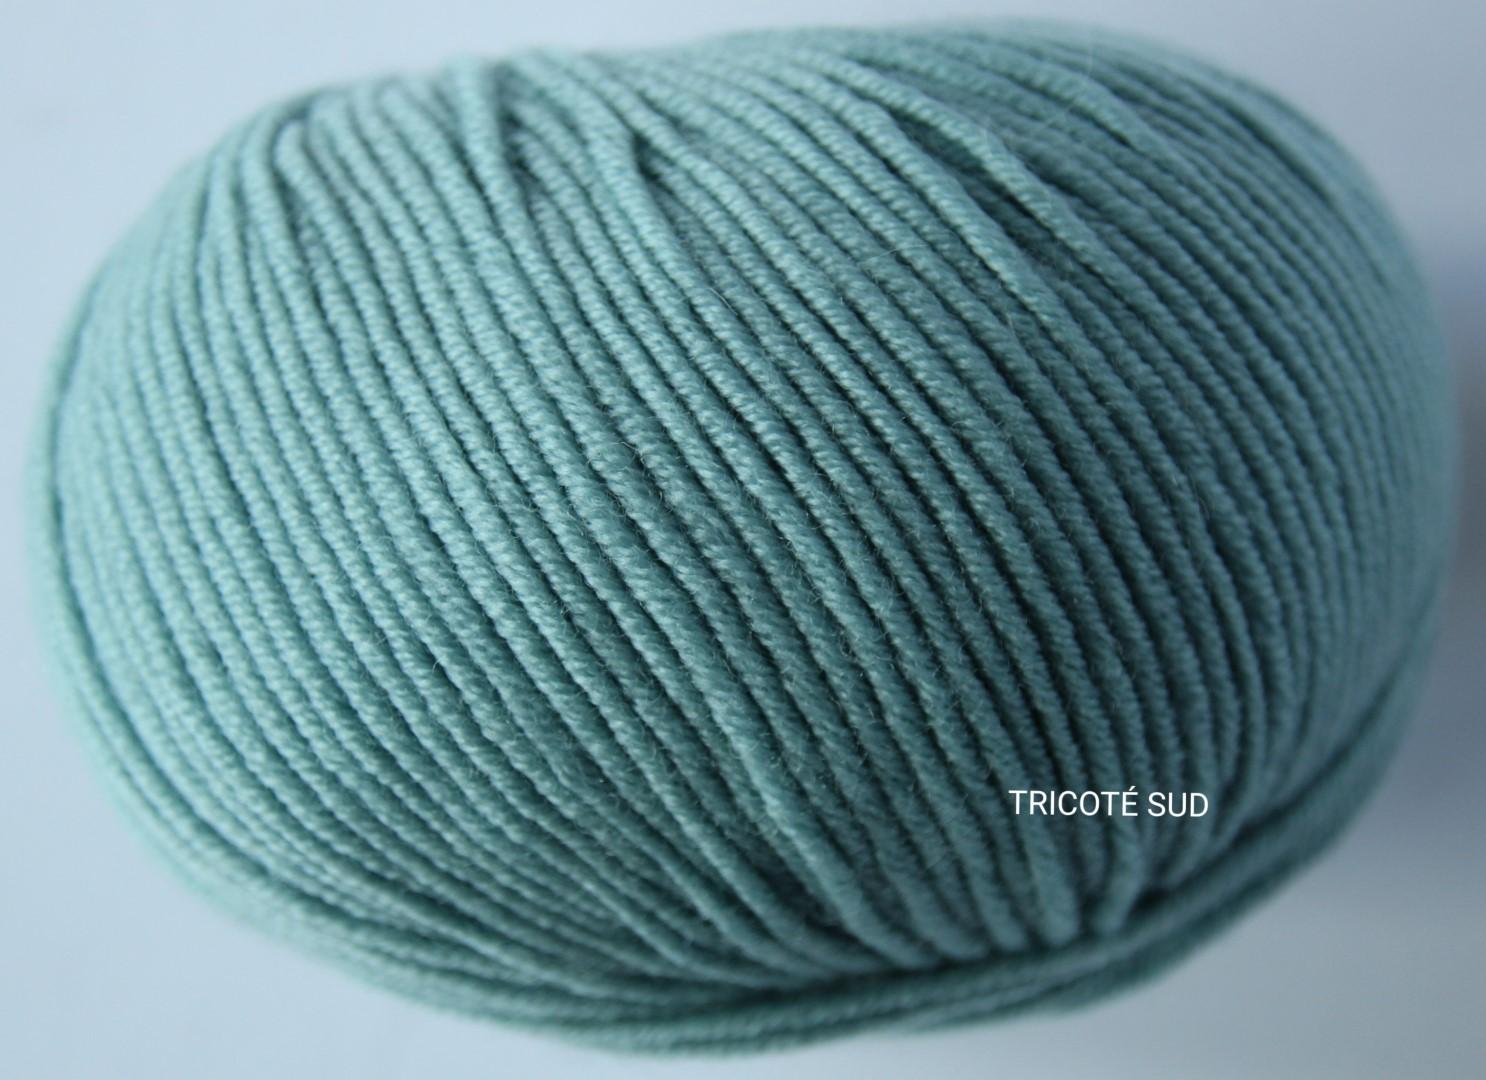 MERINO 120 COLORIS 174 (2) (Large)